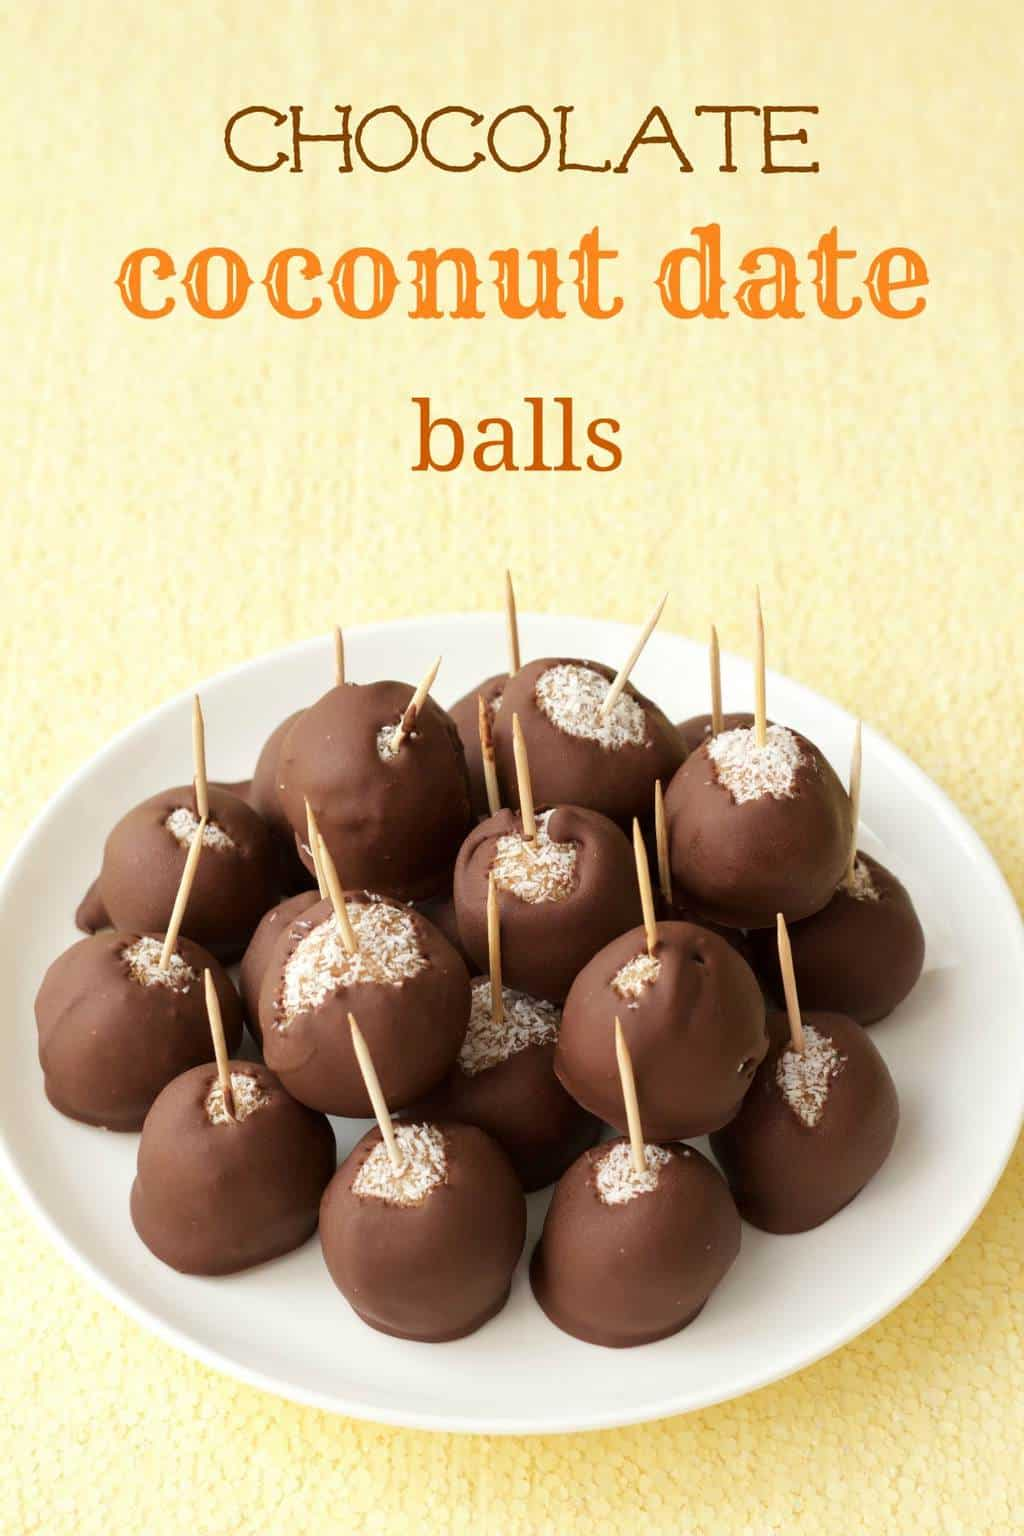 Chocolate Coconut Date Balls #vegan #lovingitvegan #dessert #dateballs #coconut #dairyfree #glutenfree